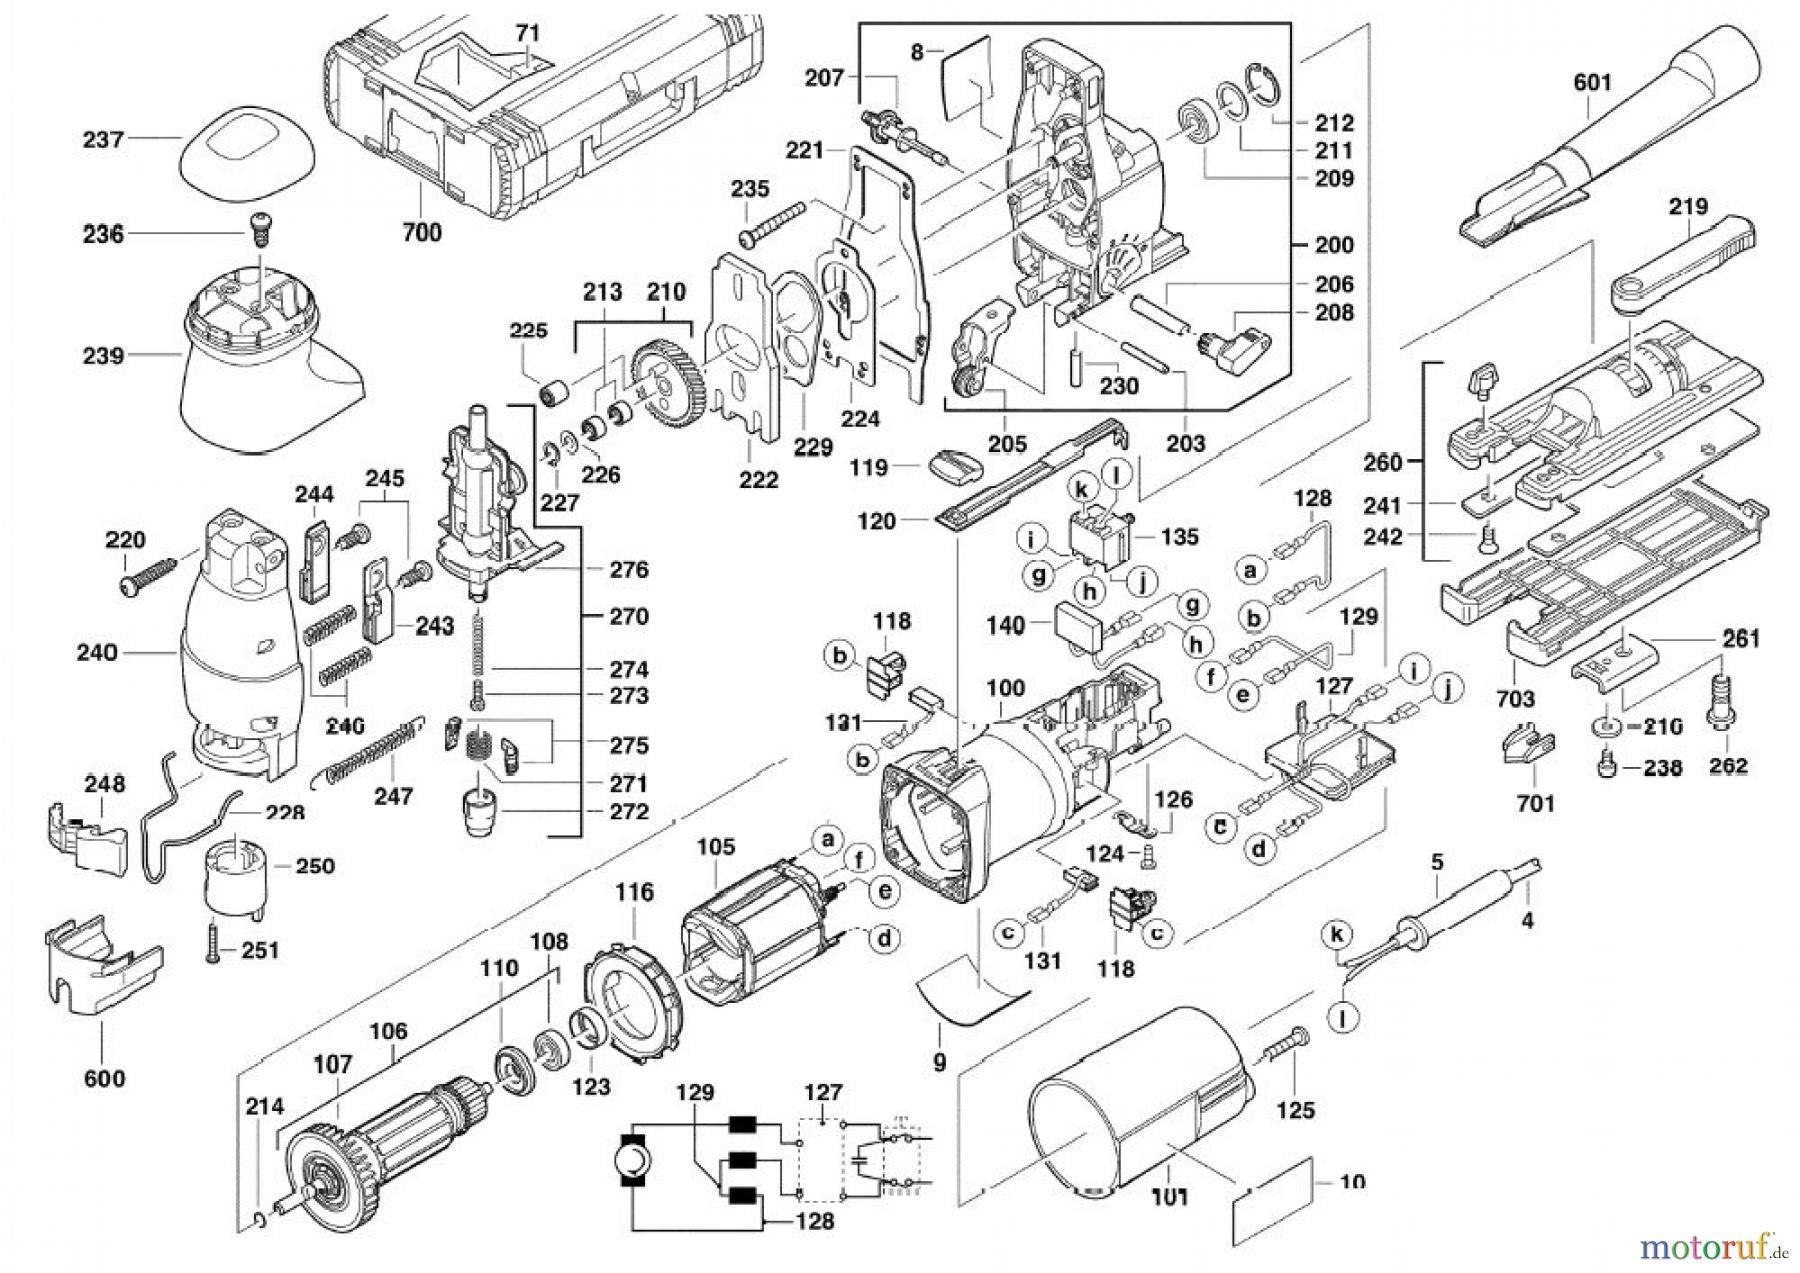 aeg powertools stichs ge step 1200 xe ersatzteile 4931624081 wire 4931624081. Black Bedroom Furniture Sets. Home Design Ideas